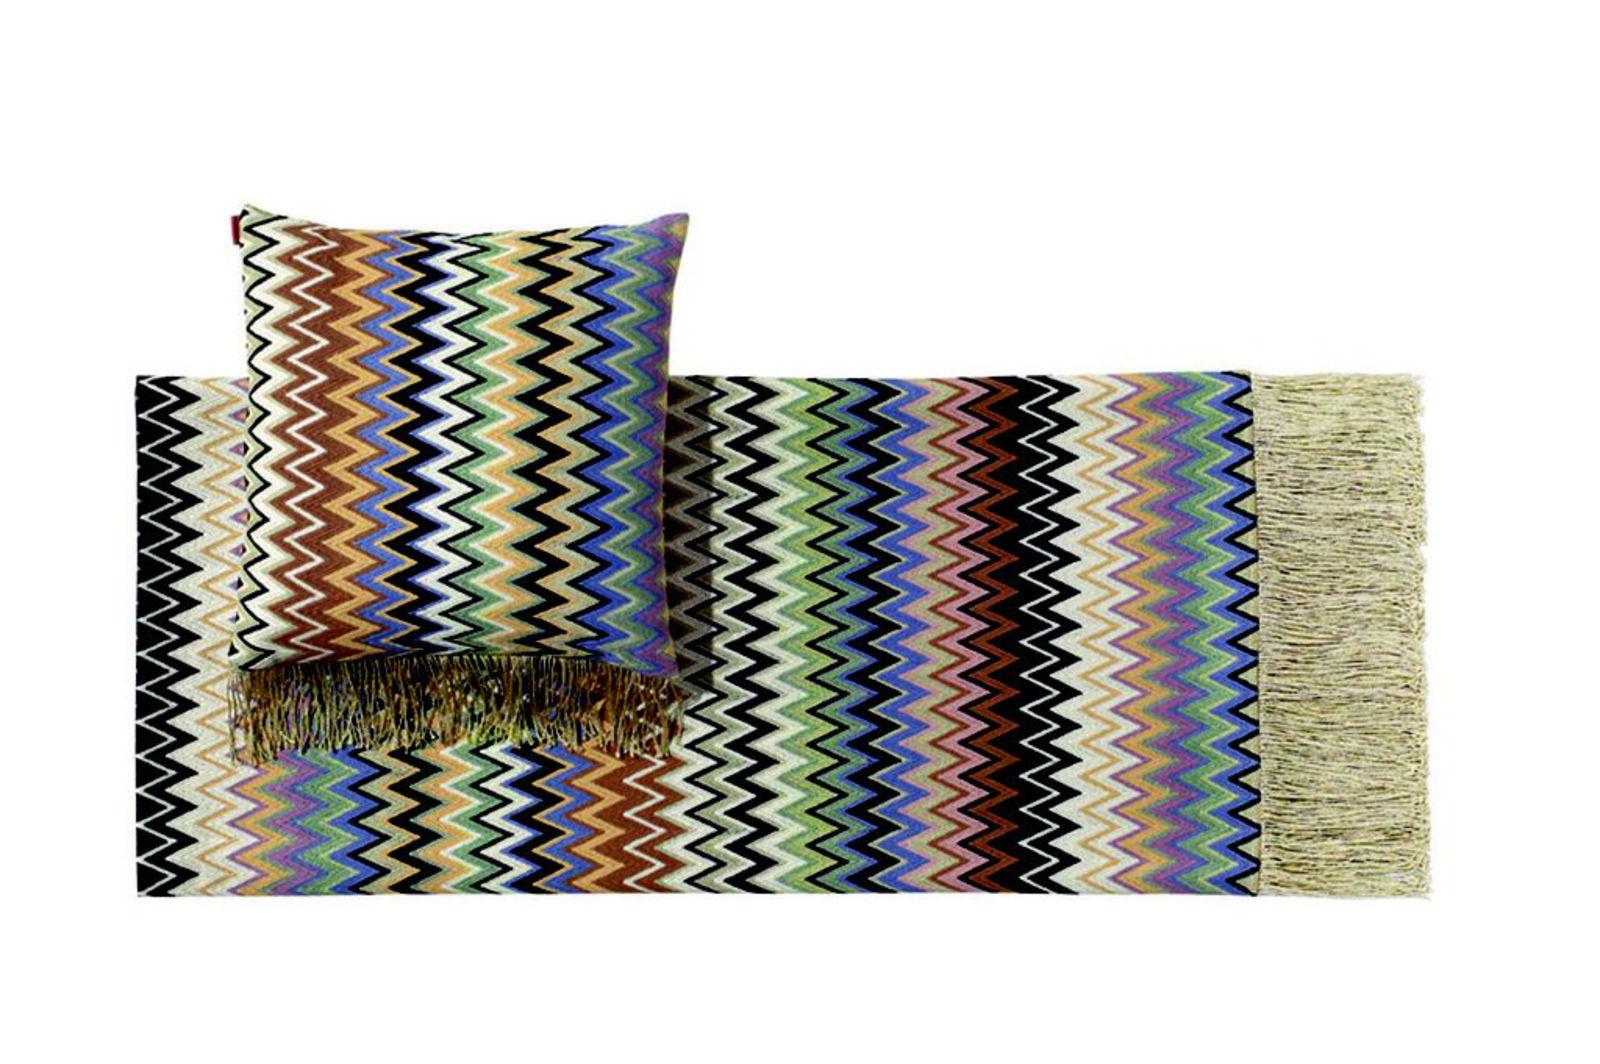 MISSONI HOME (Image 2)